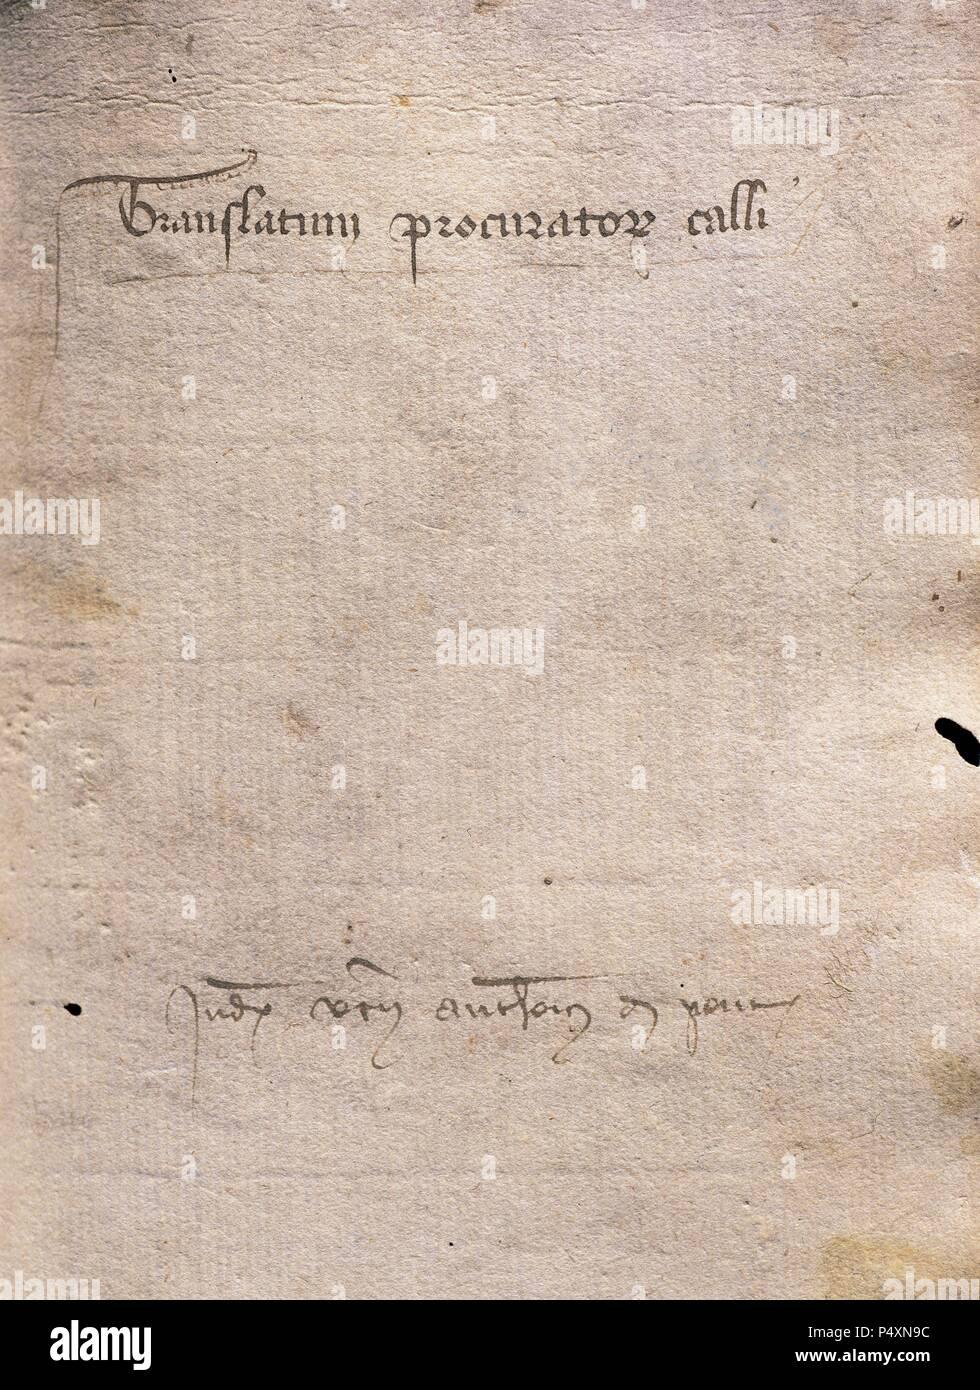 Translatum Procuratoris Calli Judeorum Barchinone. 1409. Title cover of a document on a debt. Diocesan Archive. Barcelona. Catalonia. Spain. - Stock Image